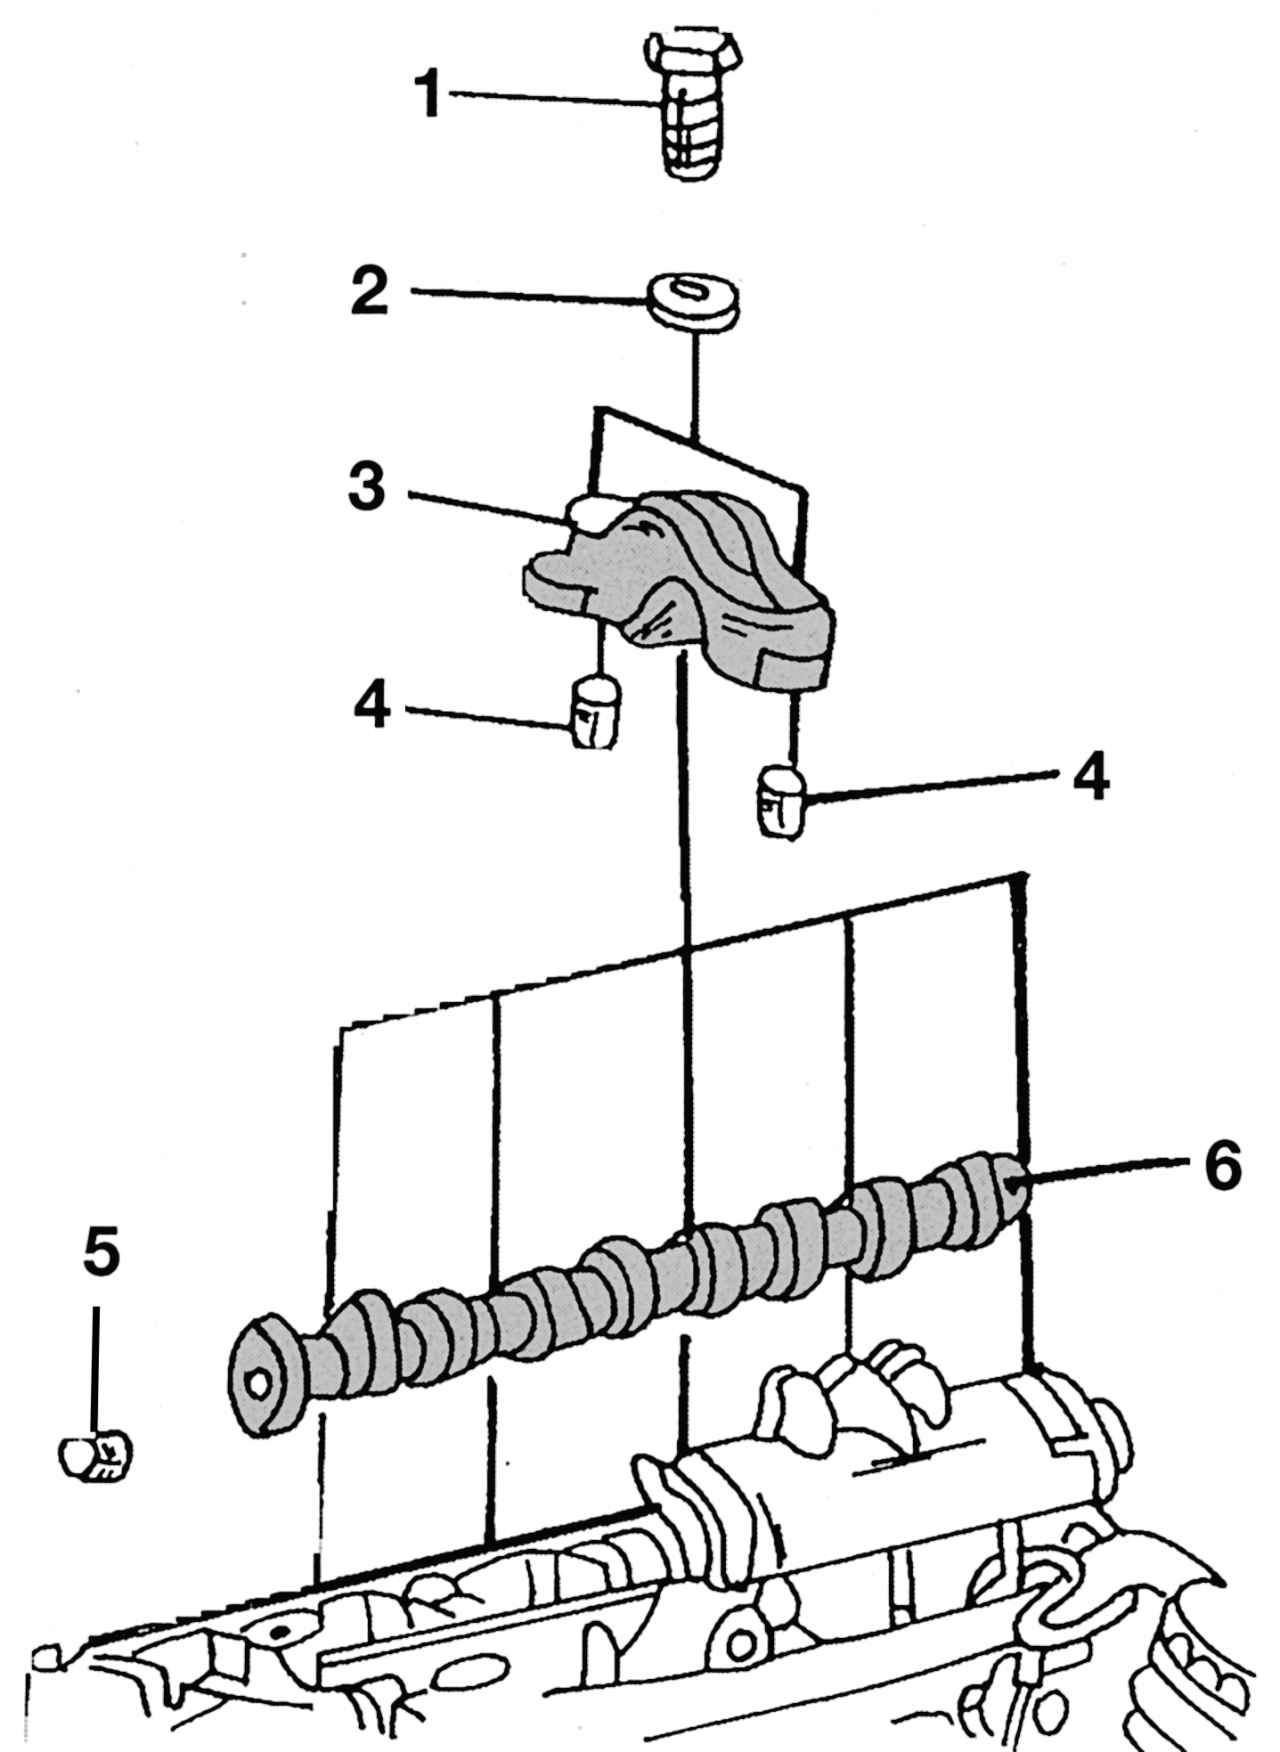 Замена троса сцепления мерседес спринтер Замена реактивной тяги xc90